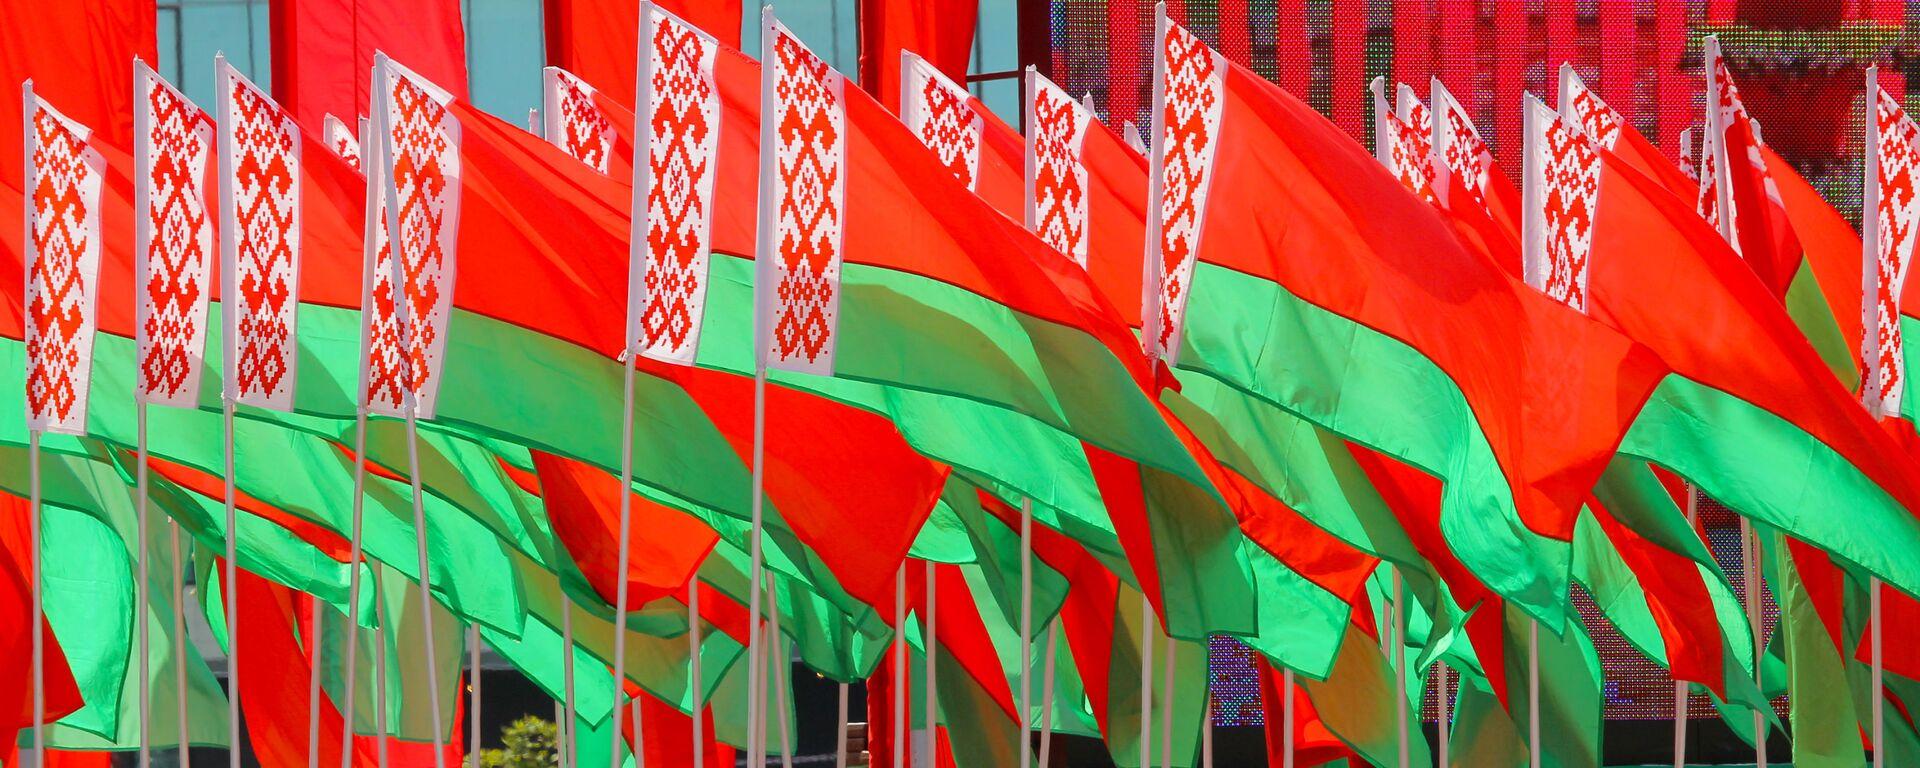 Banderas de Bielorrusia - Sputnik Mundo, 1920, 29.12.2020